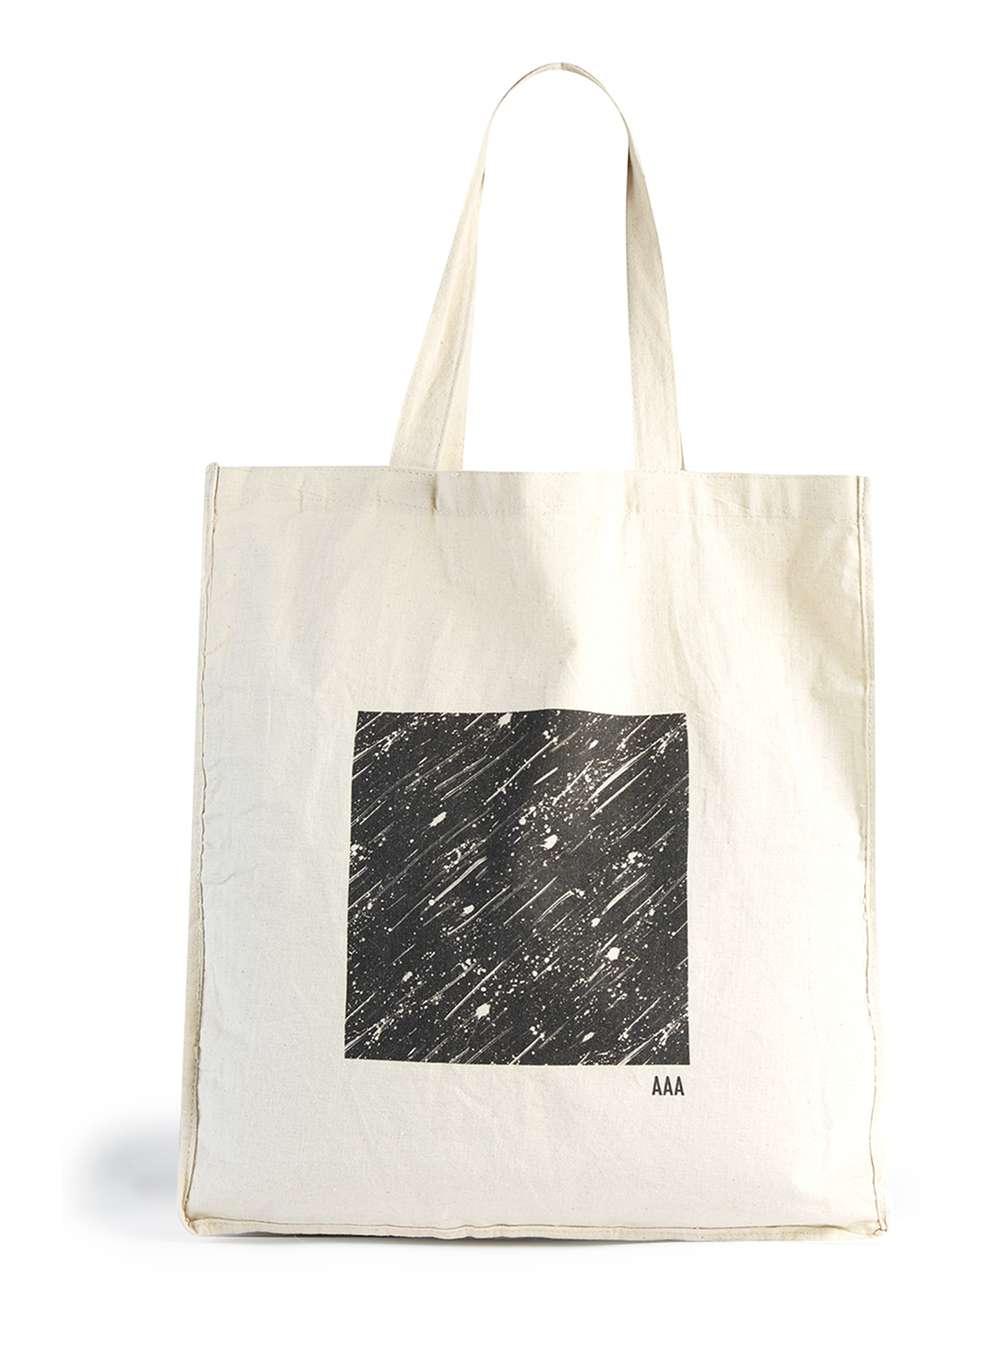 TOPMAN  AAA White Shopper Bag , £10